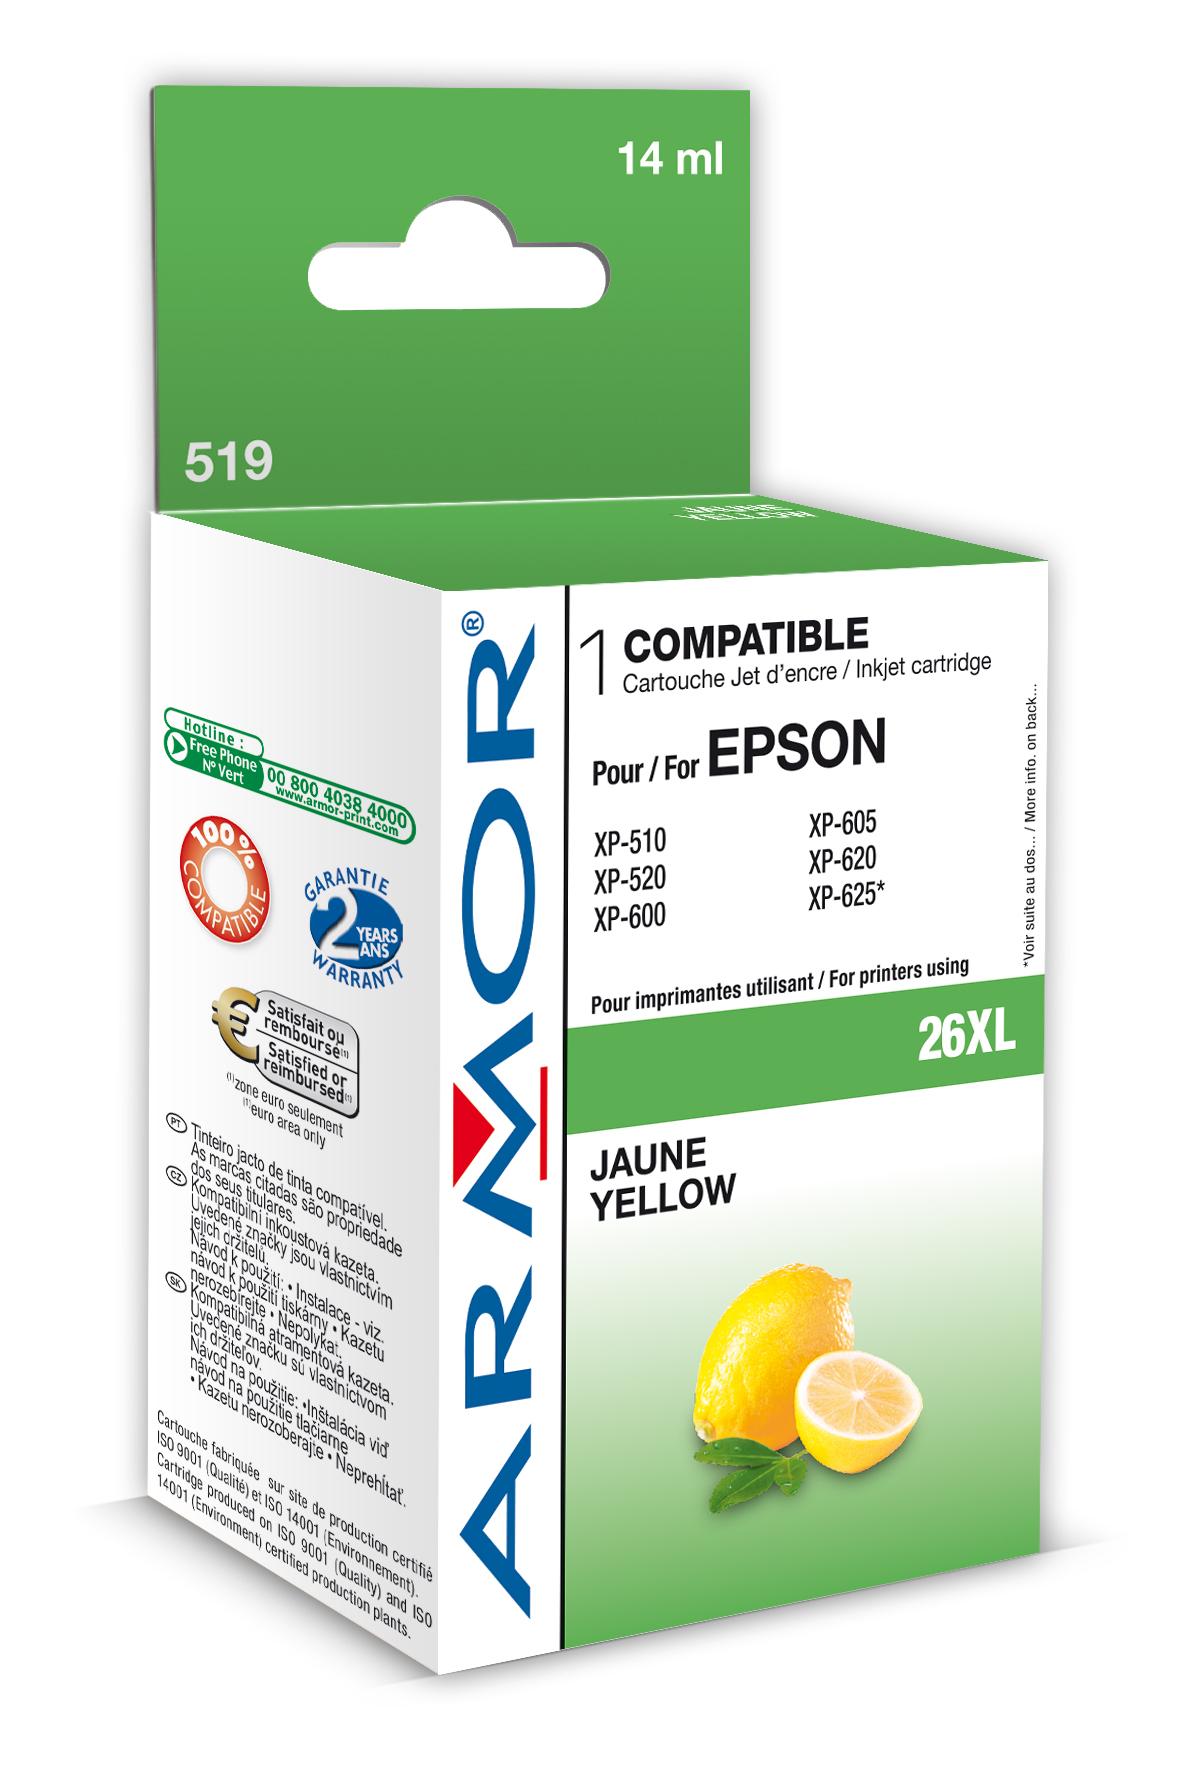 Armor ink-jet pro Epson XP510/520 T26344010 Y